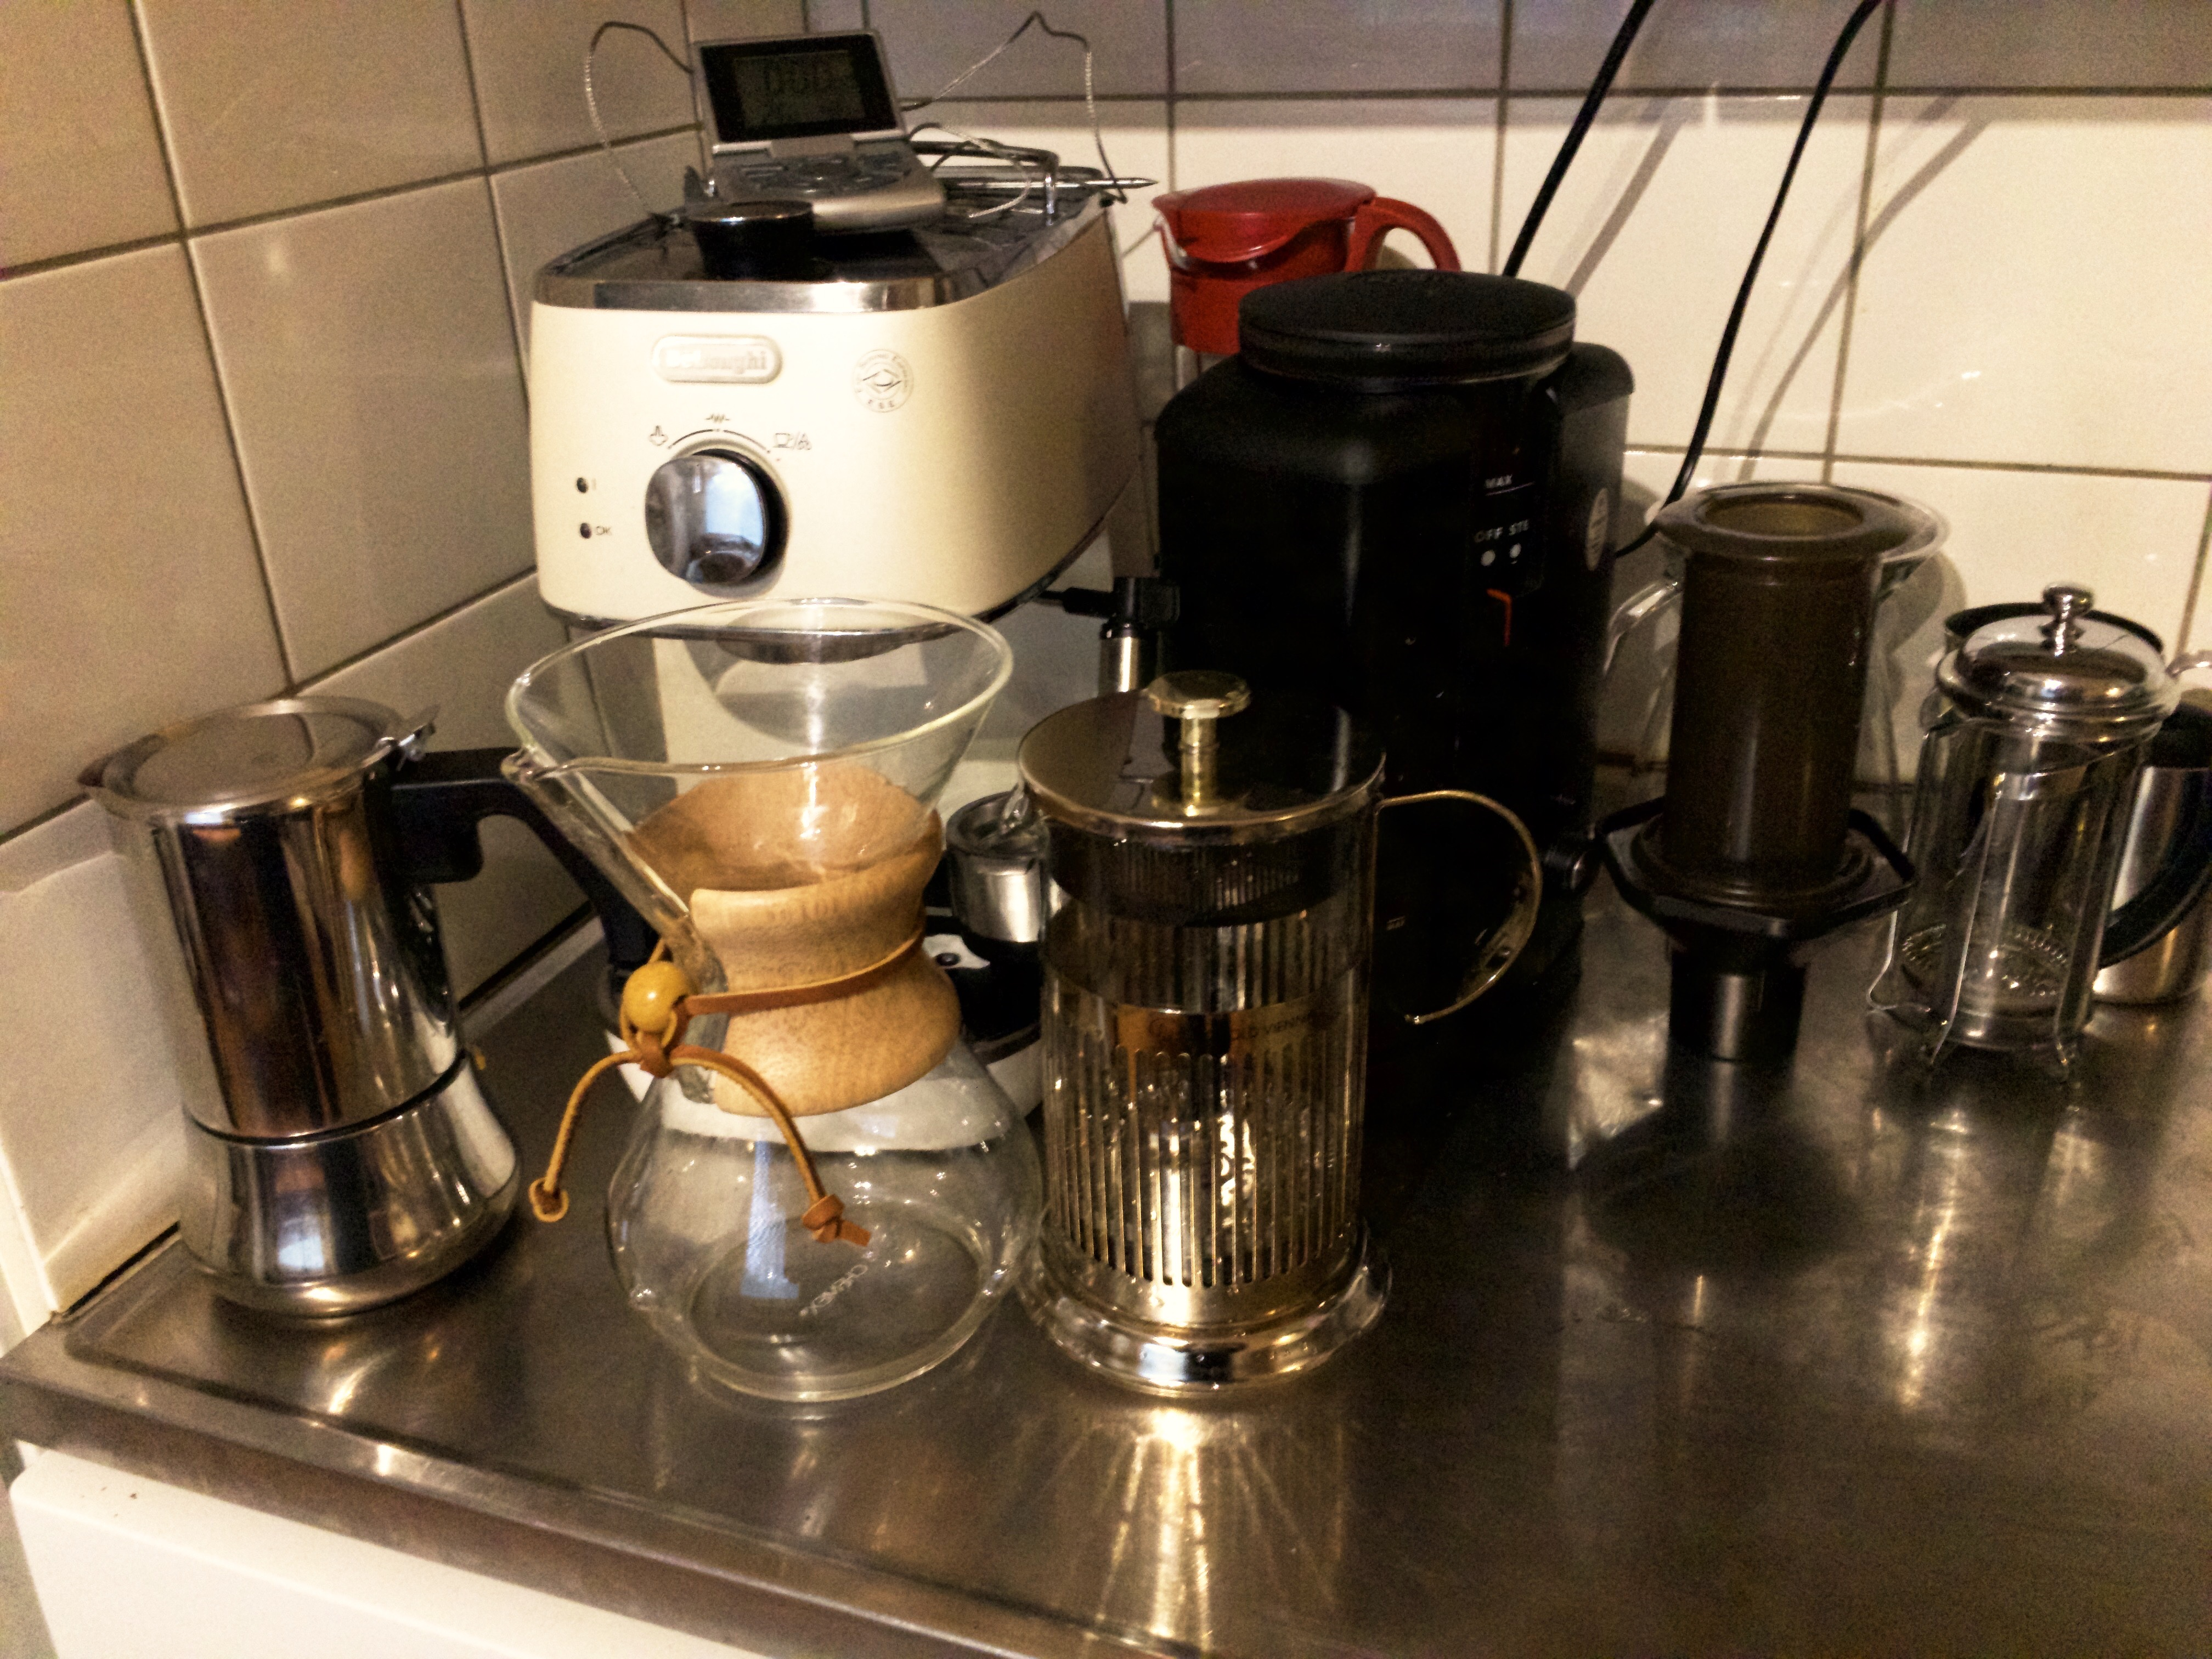 My coffee equipment